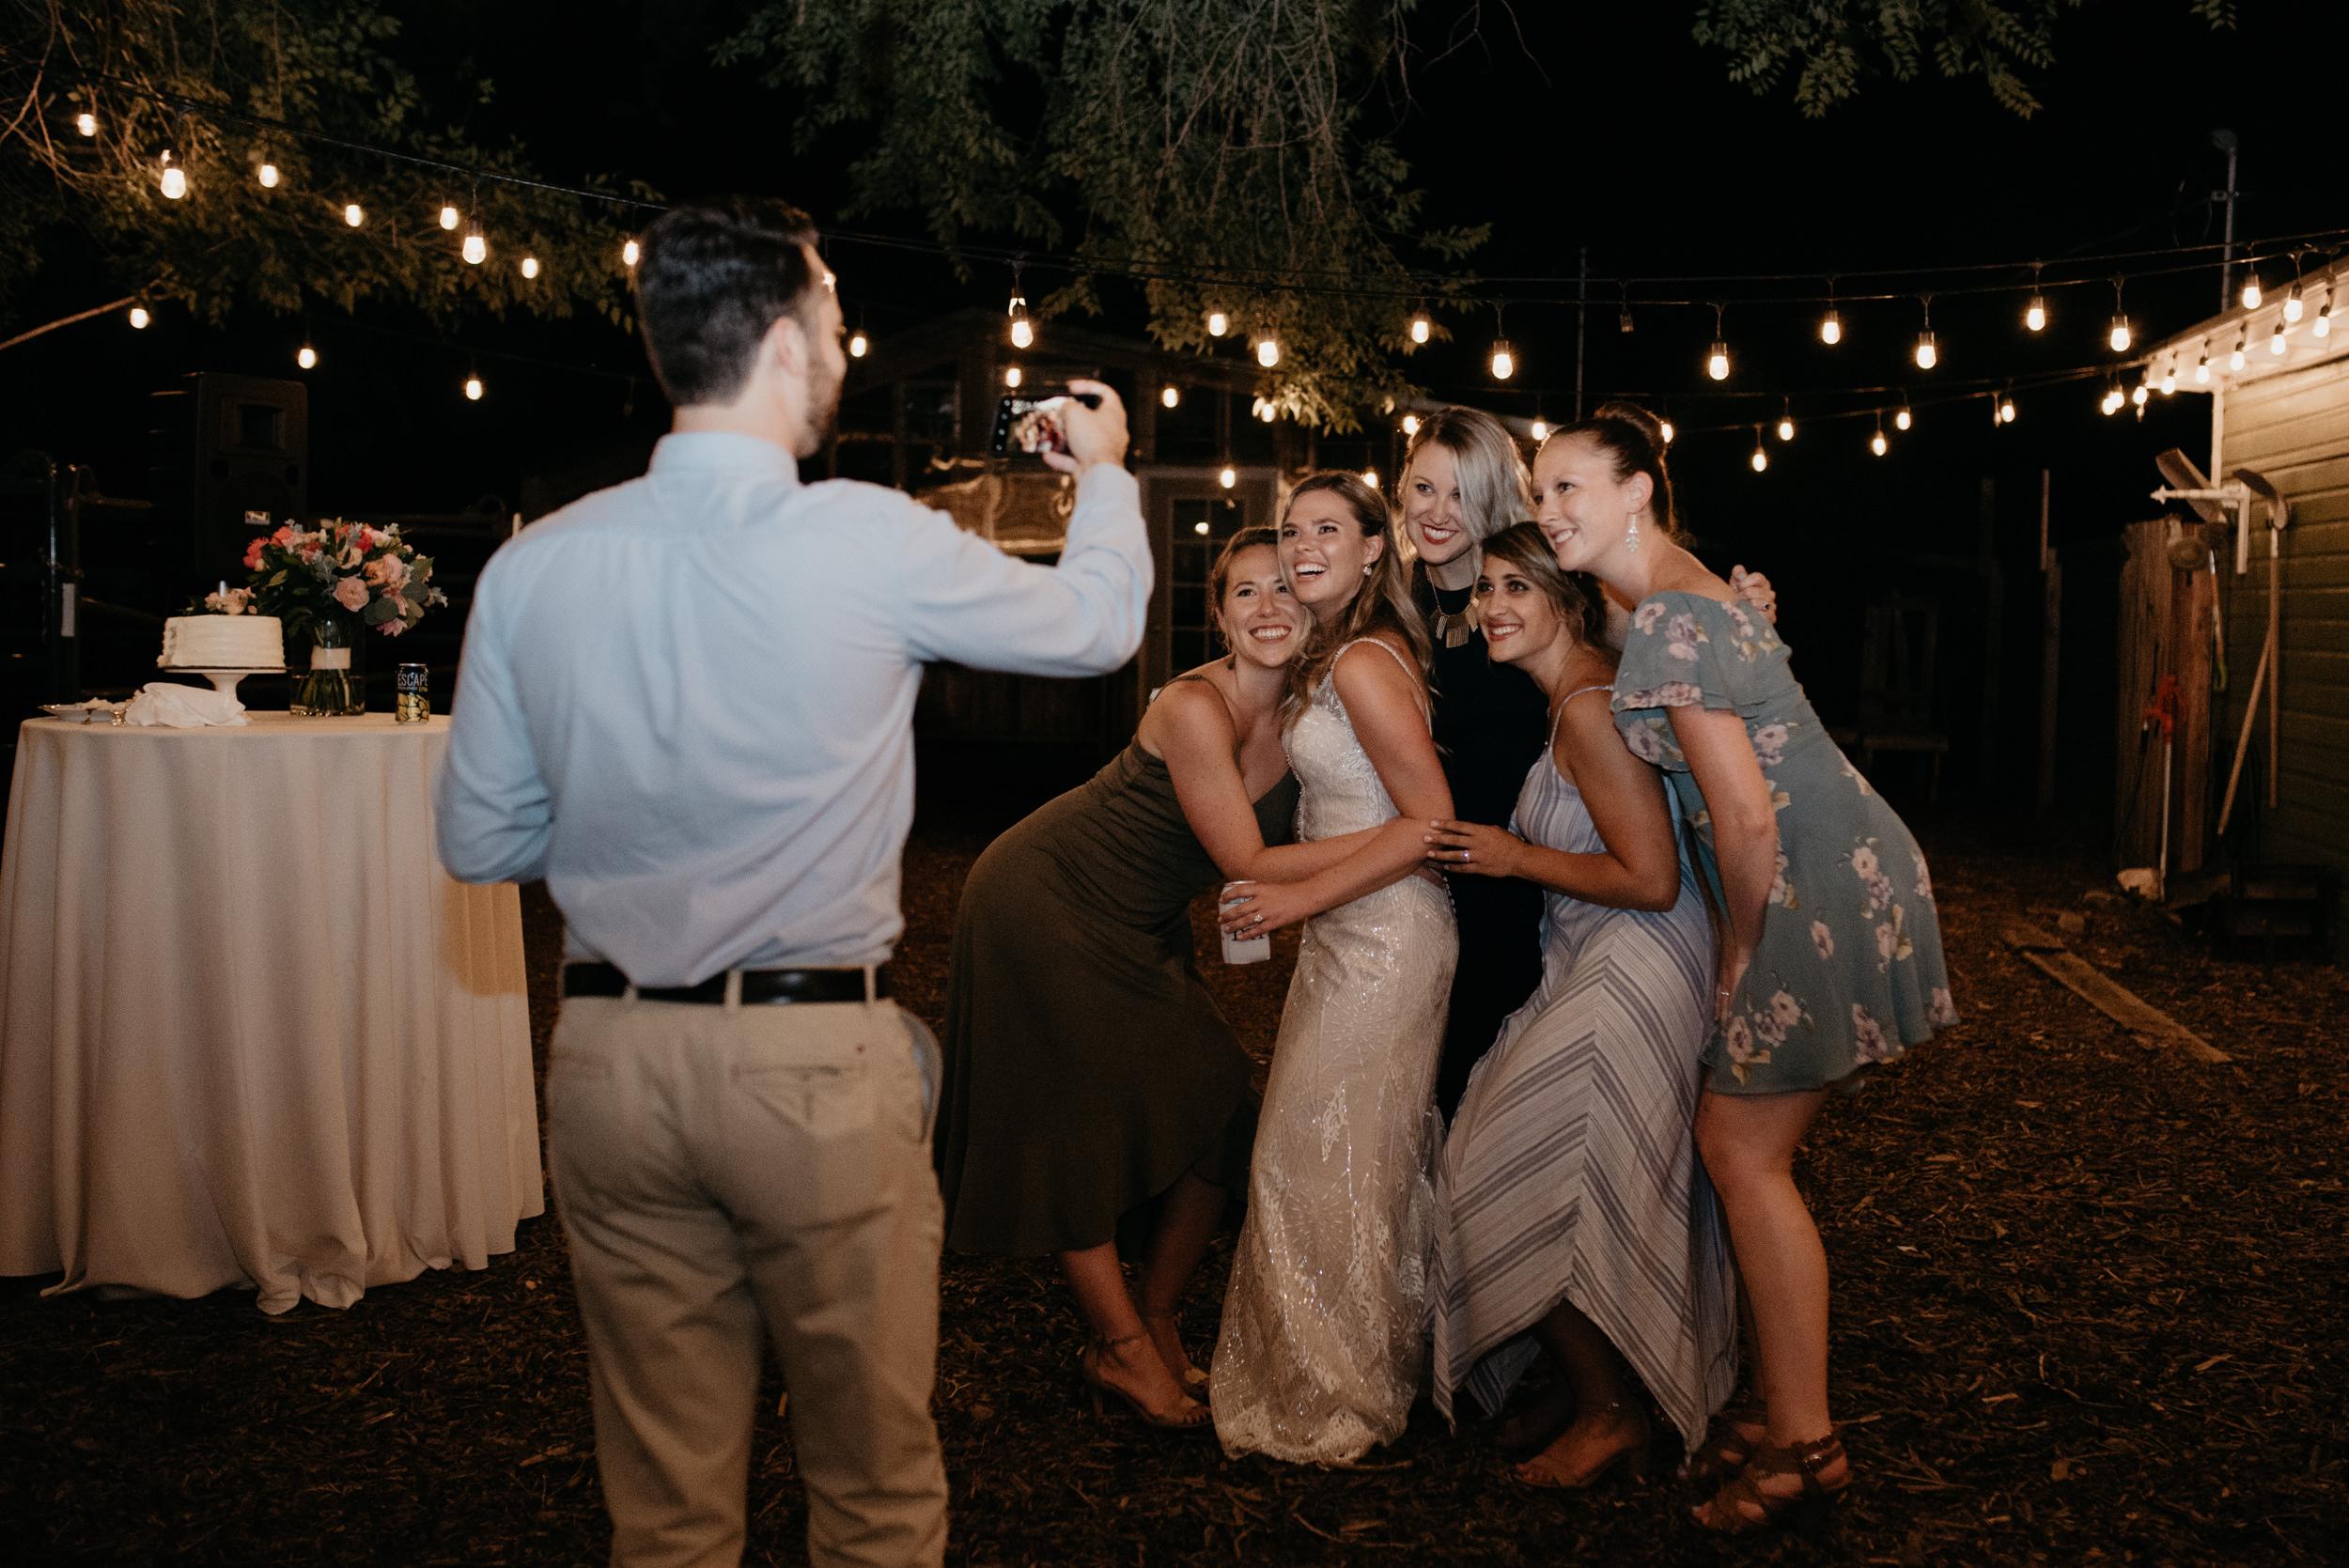 Friends taking photos at Three Leaf Farm wedding. Boulder, Colorado wedding and elopement photographer.